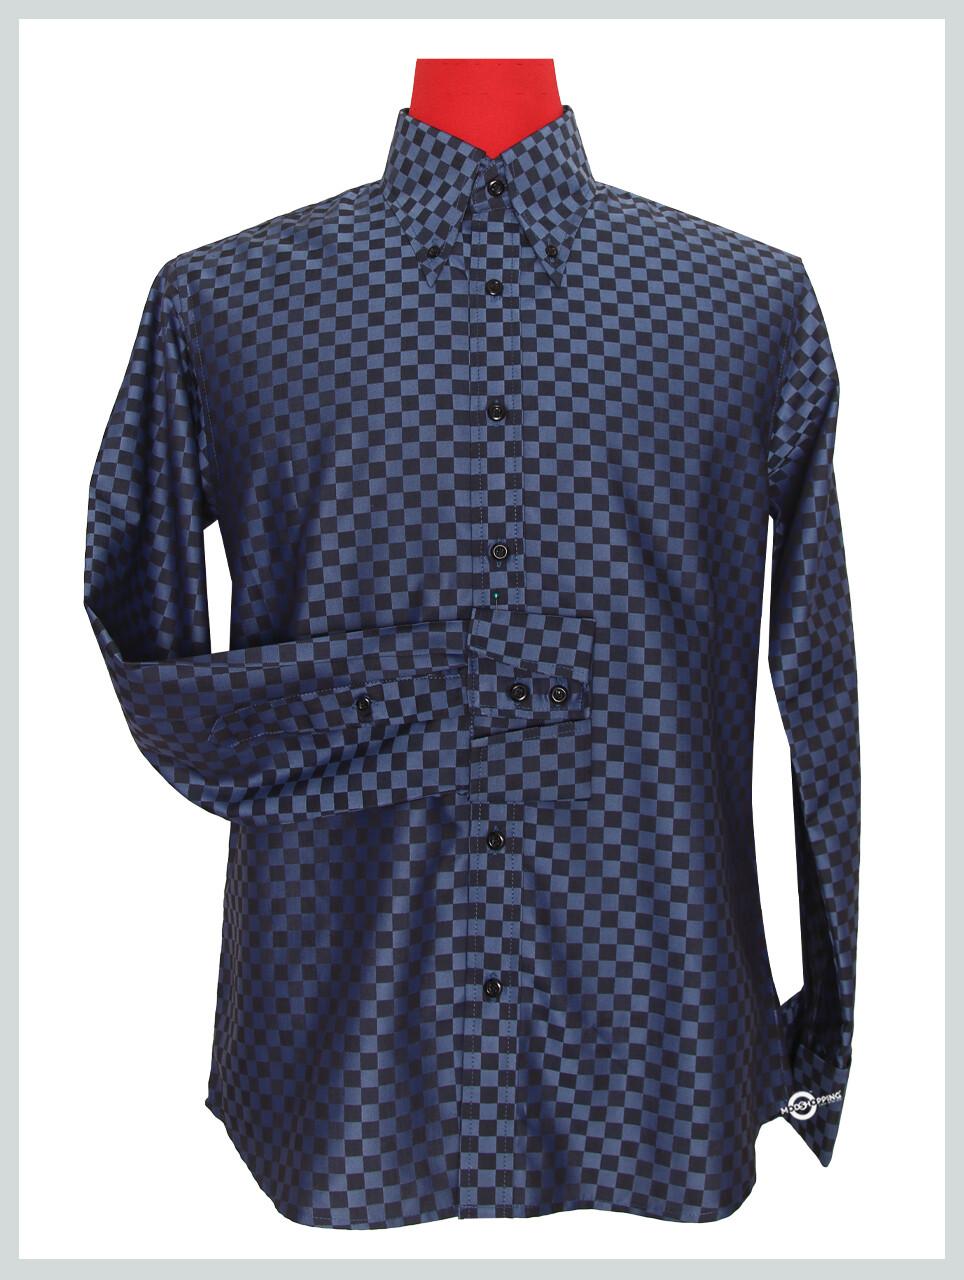 Long Sleeve Shirt Ska Check Navy Blue Shirt For Men's